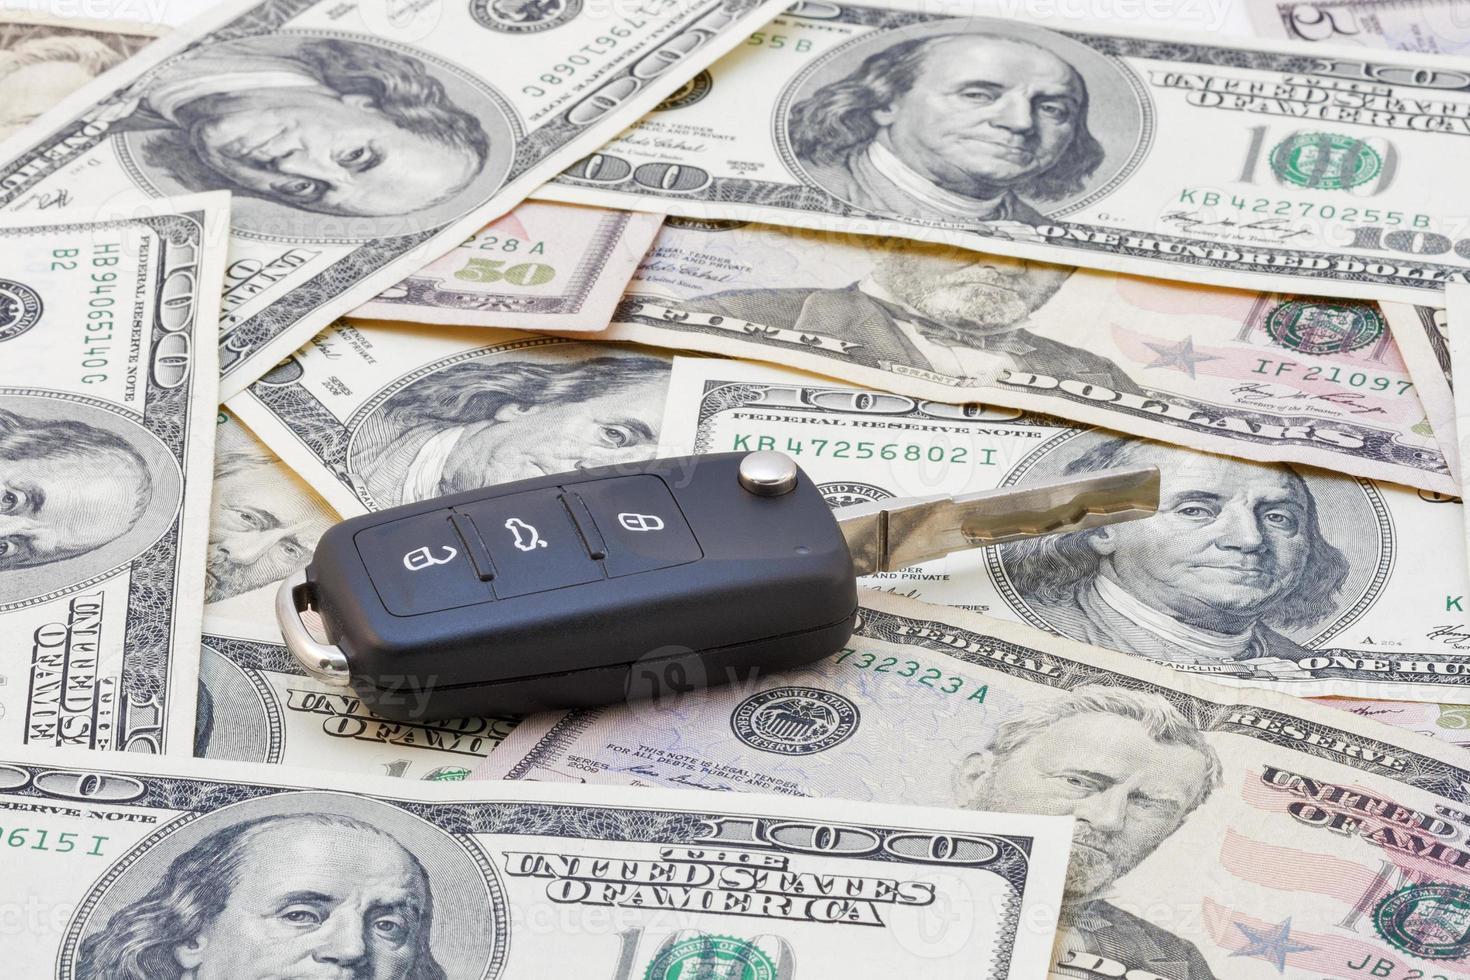 chaves do carro sobre as notas de dólar foto